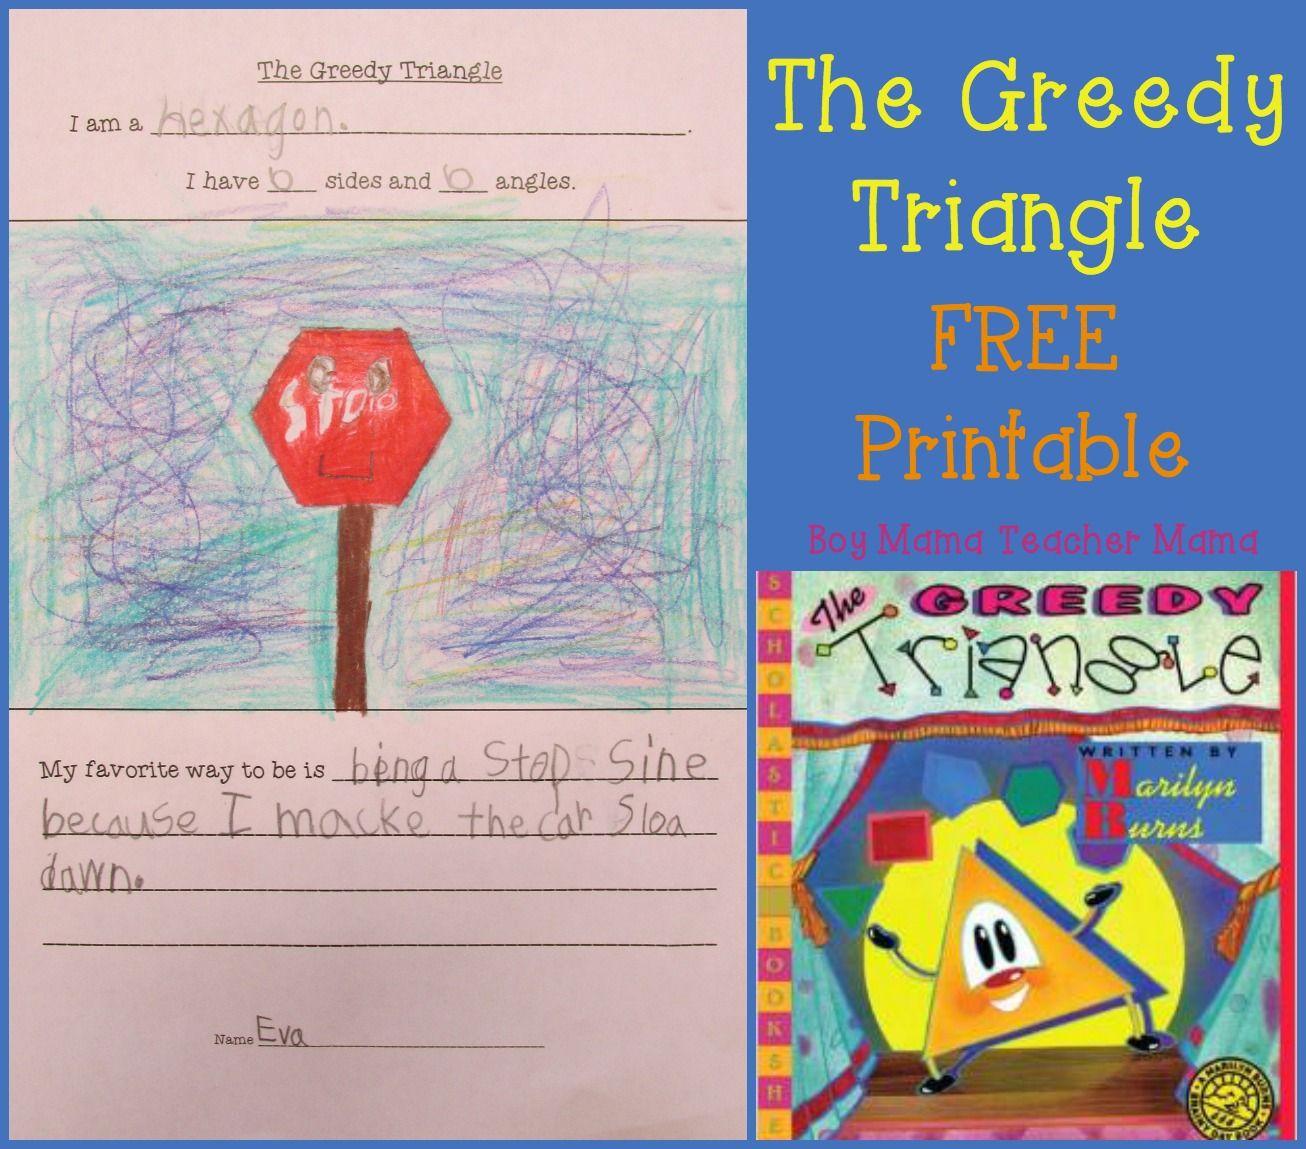 The Greedy Triangle Free Printable